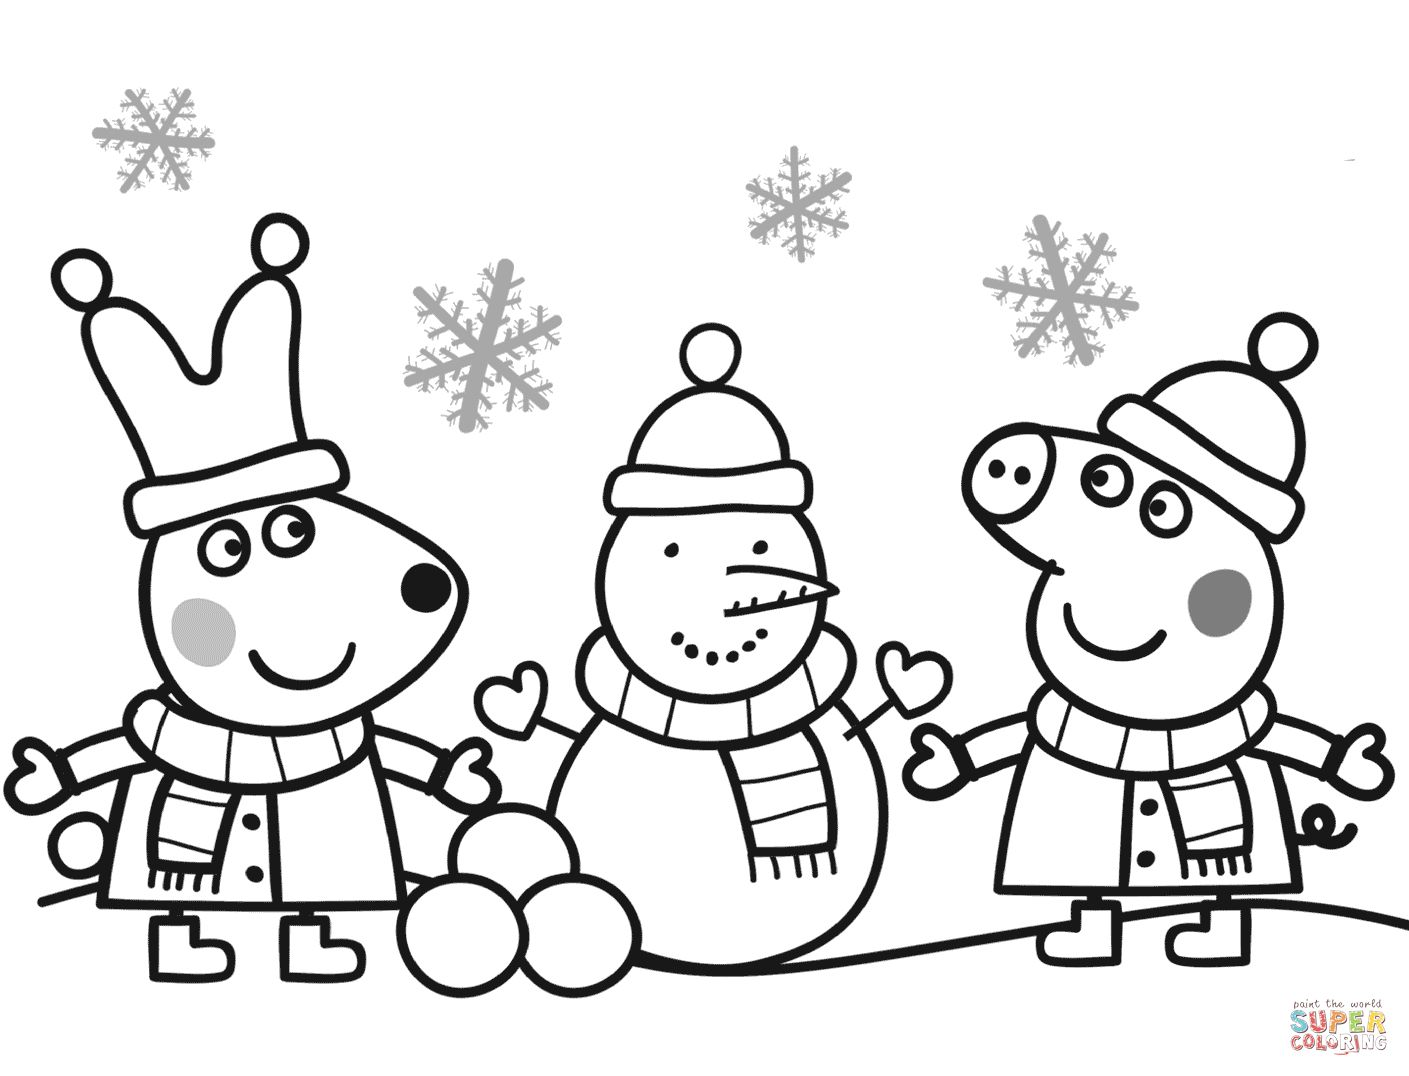 Peppa Pig Printable Coloring Pages Peppa Pig Coloring Pages Free Coloring Pages Albanysinsanity Com In 2020 Peppa Pig Coloring Pages Peppa Pig Colouring Peppa Pig Christmas